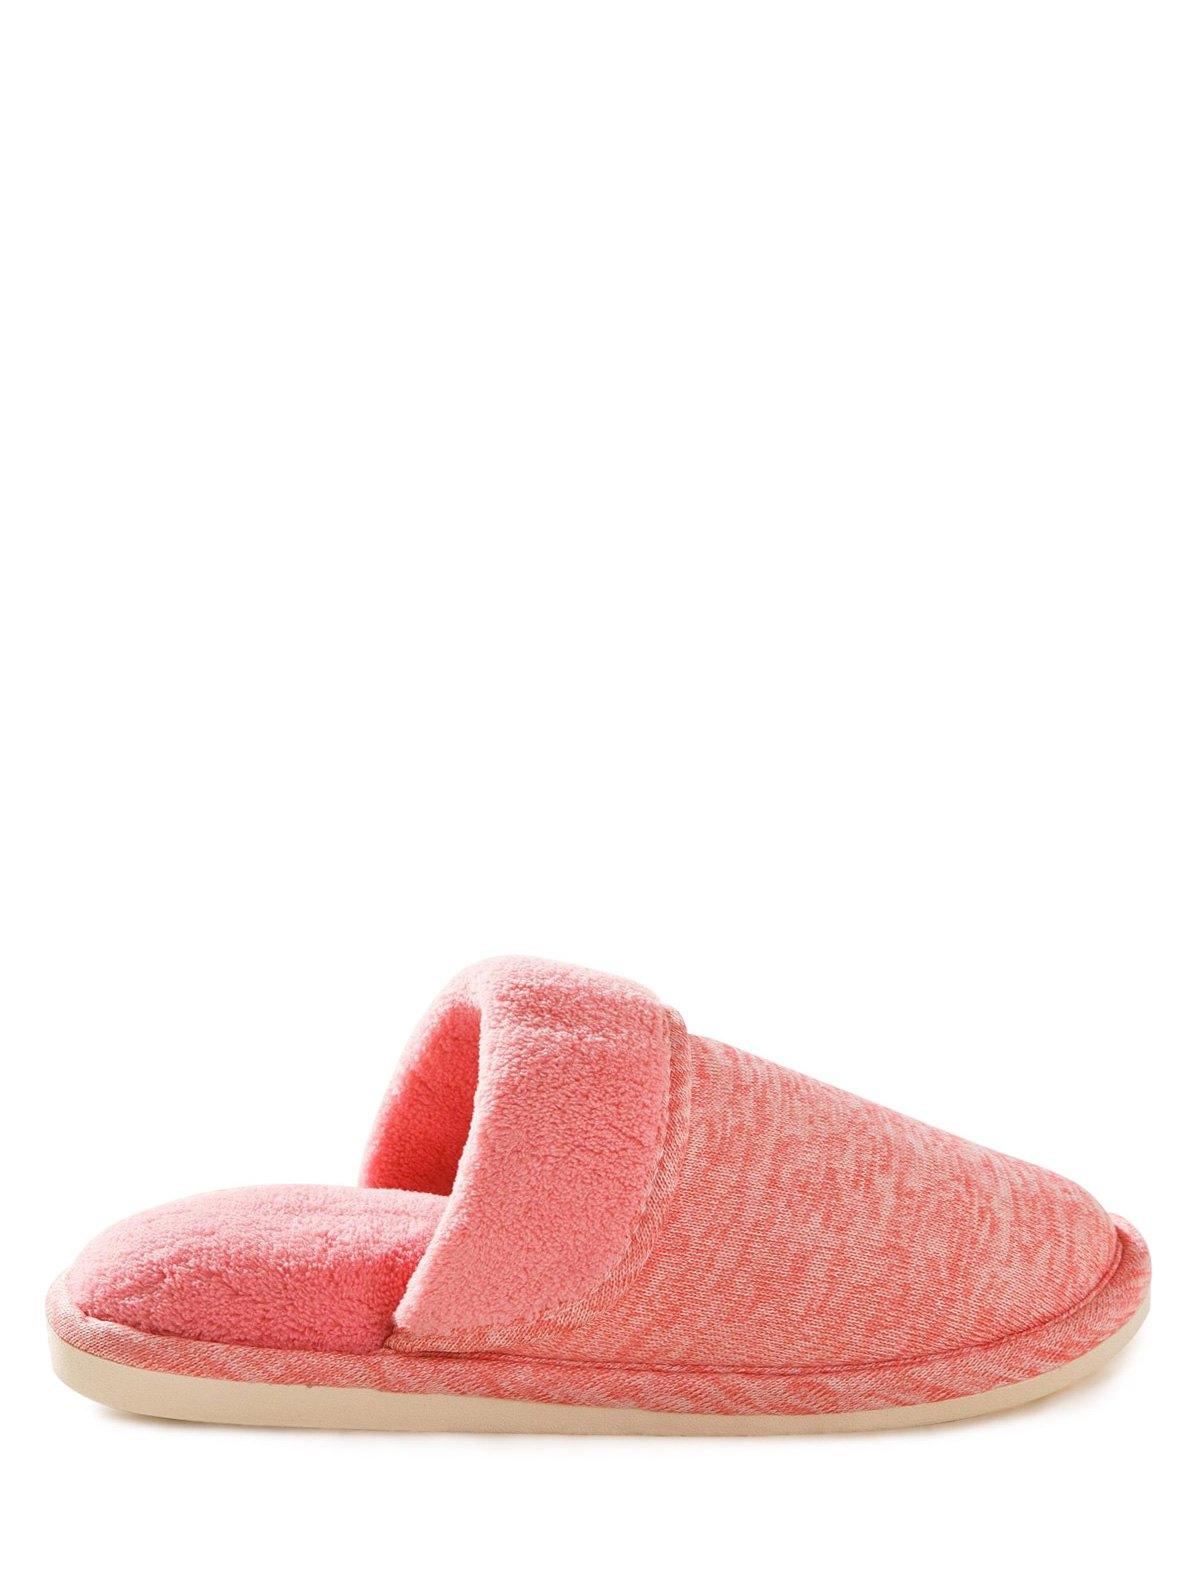 Flocking Flat Heel House Slippers